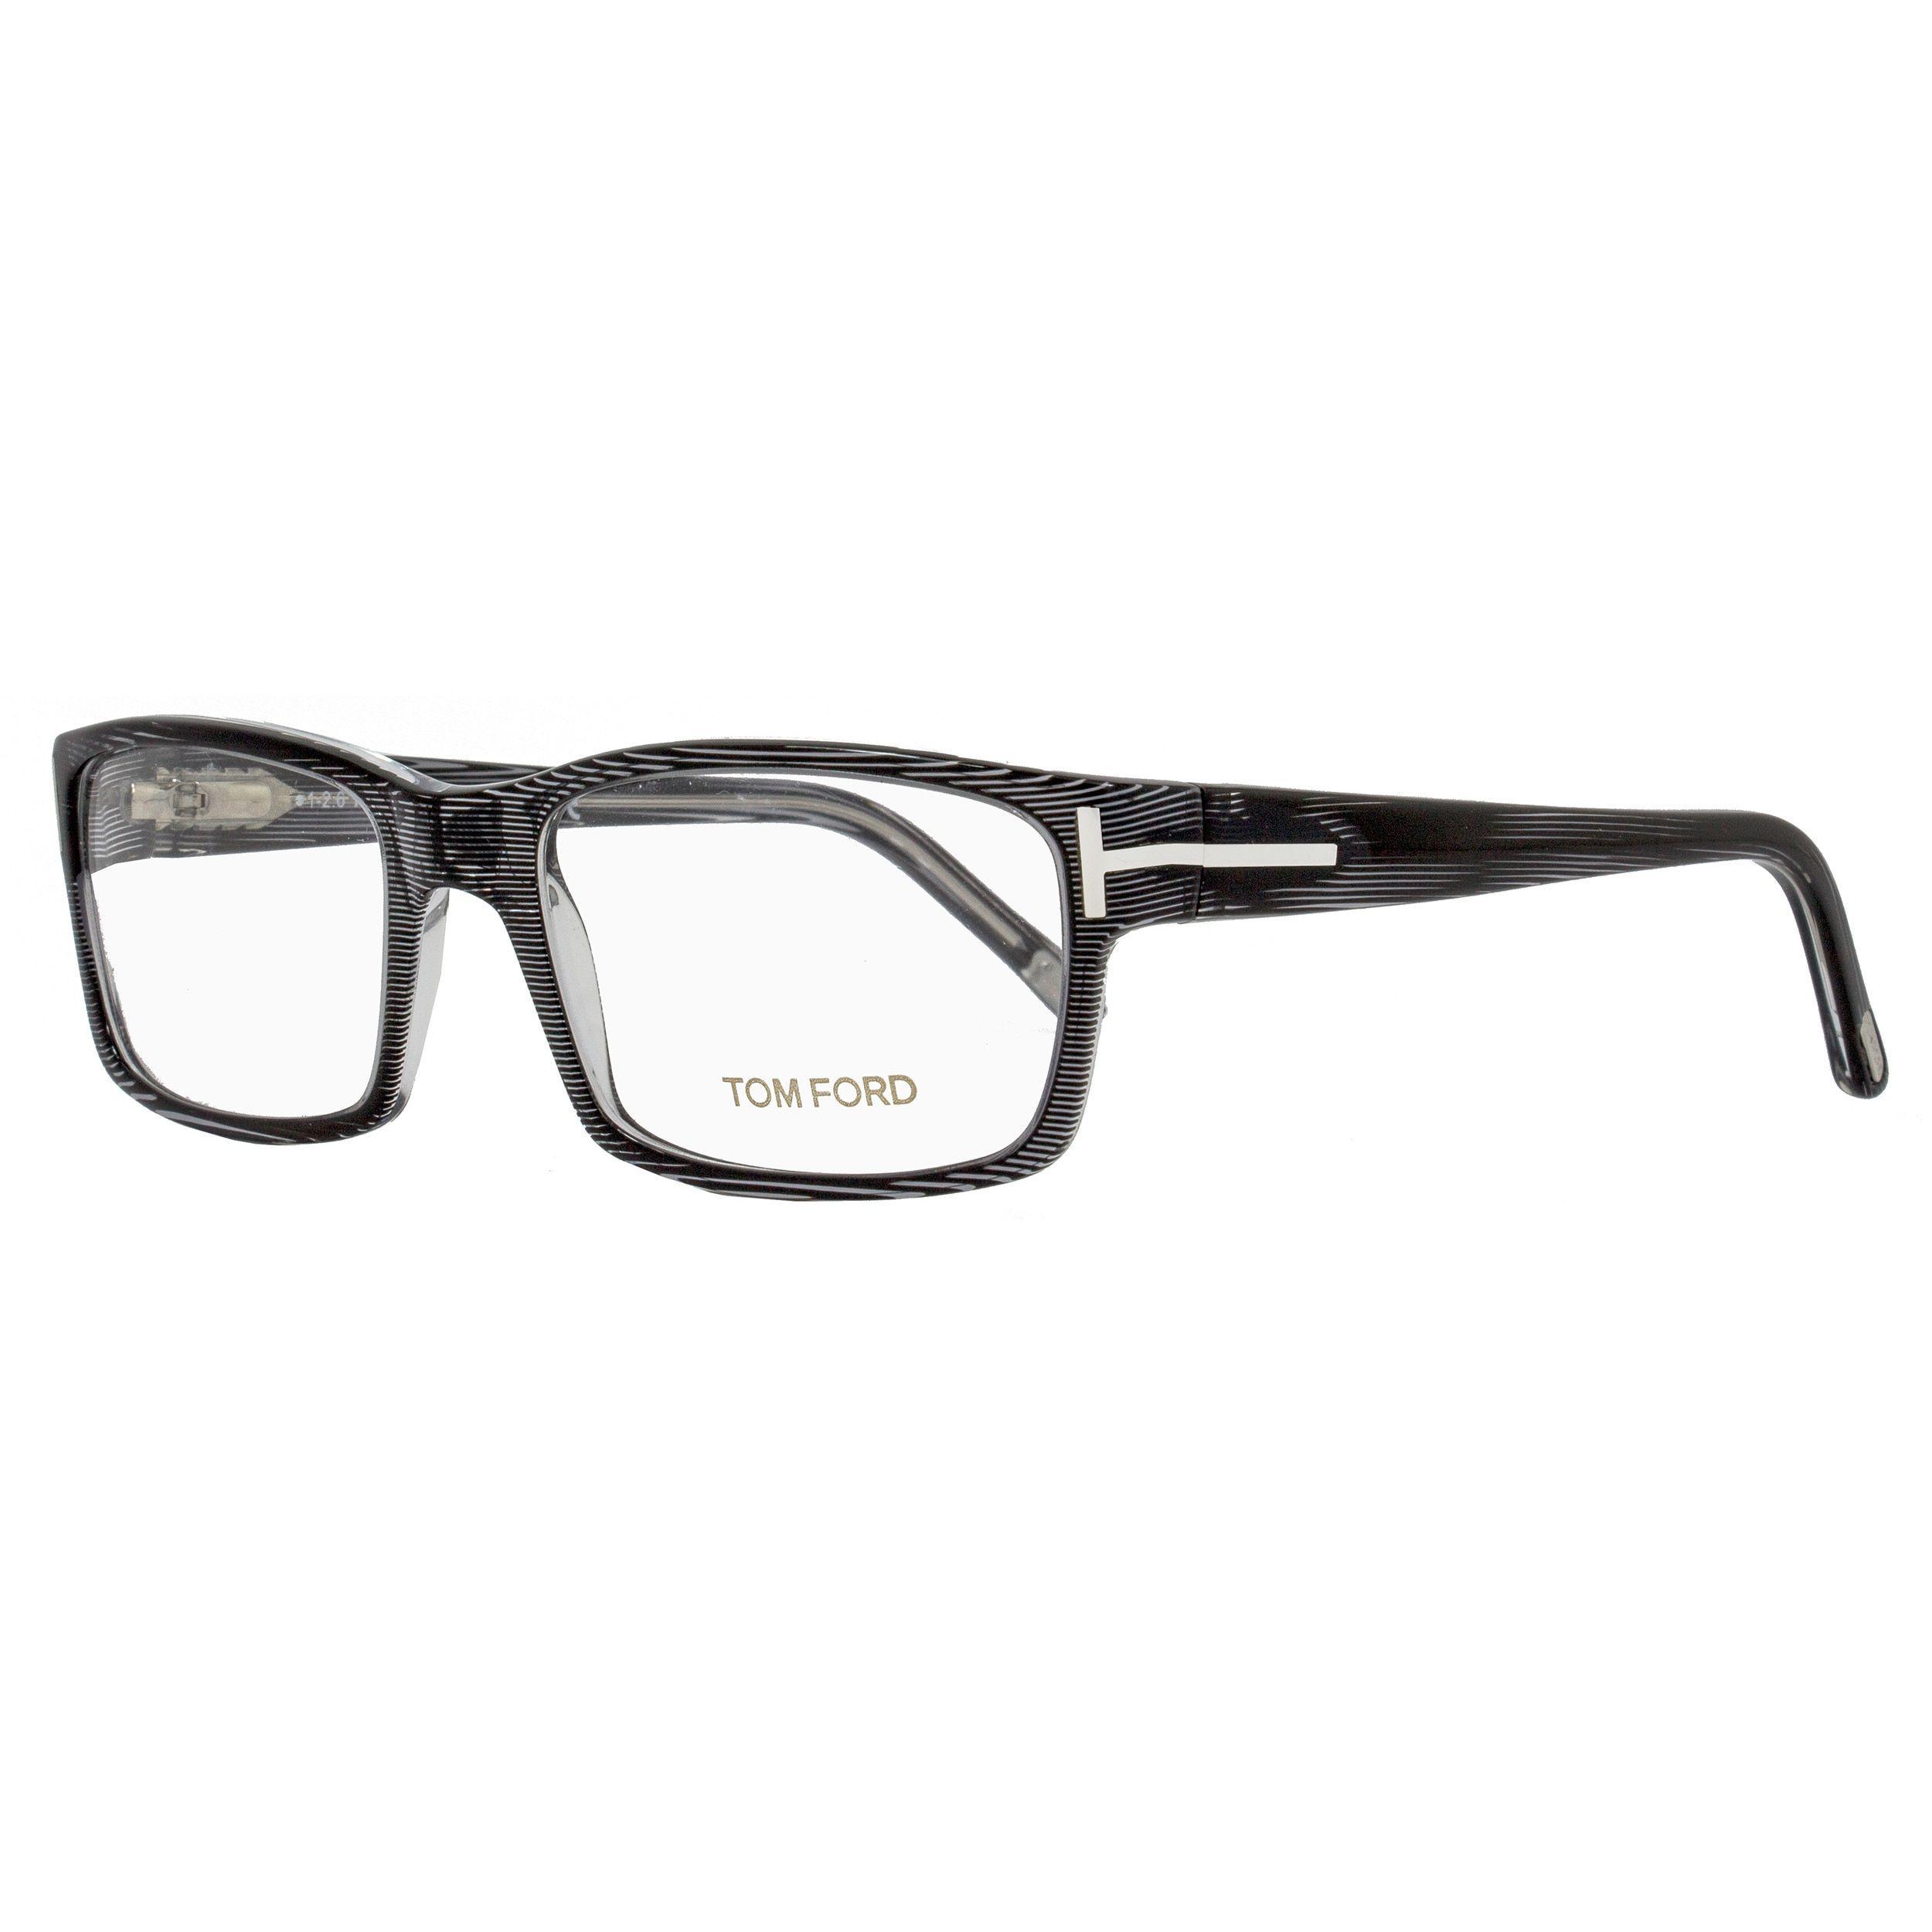 Tom Ford TF5013 R92 Mens 54 mm Eyeglasses   Products   Pinterest